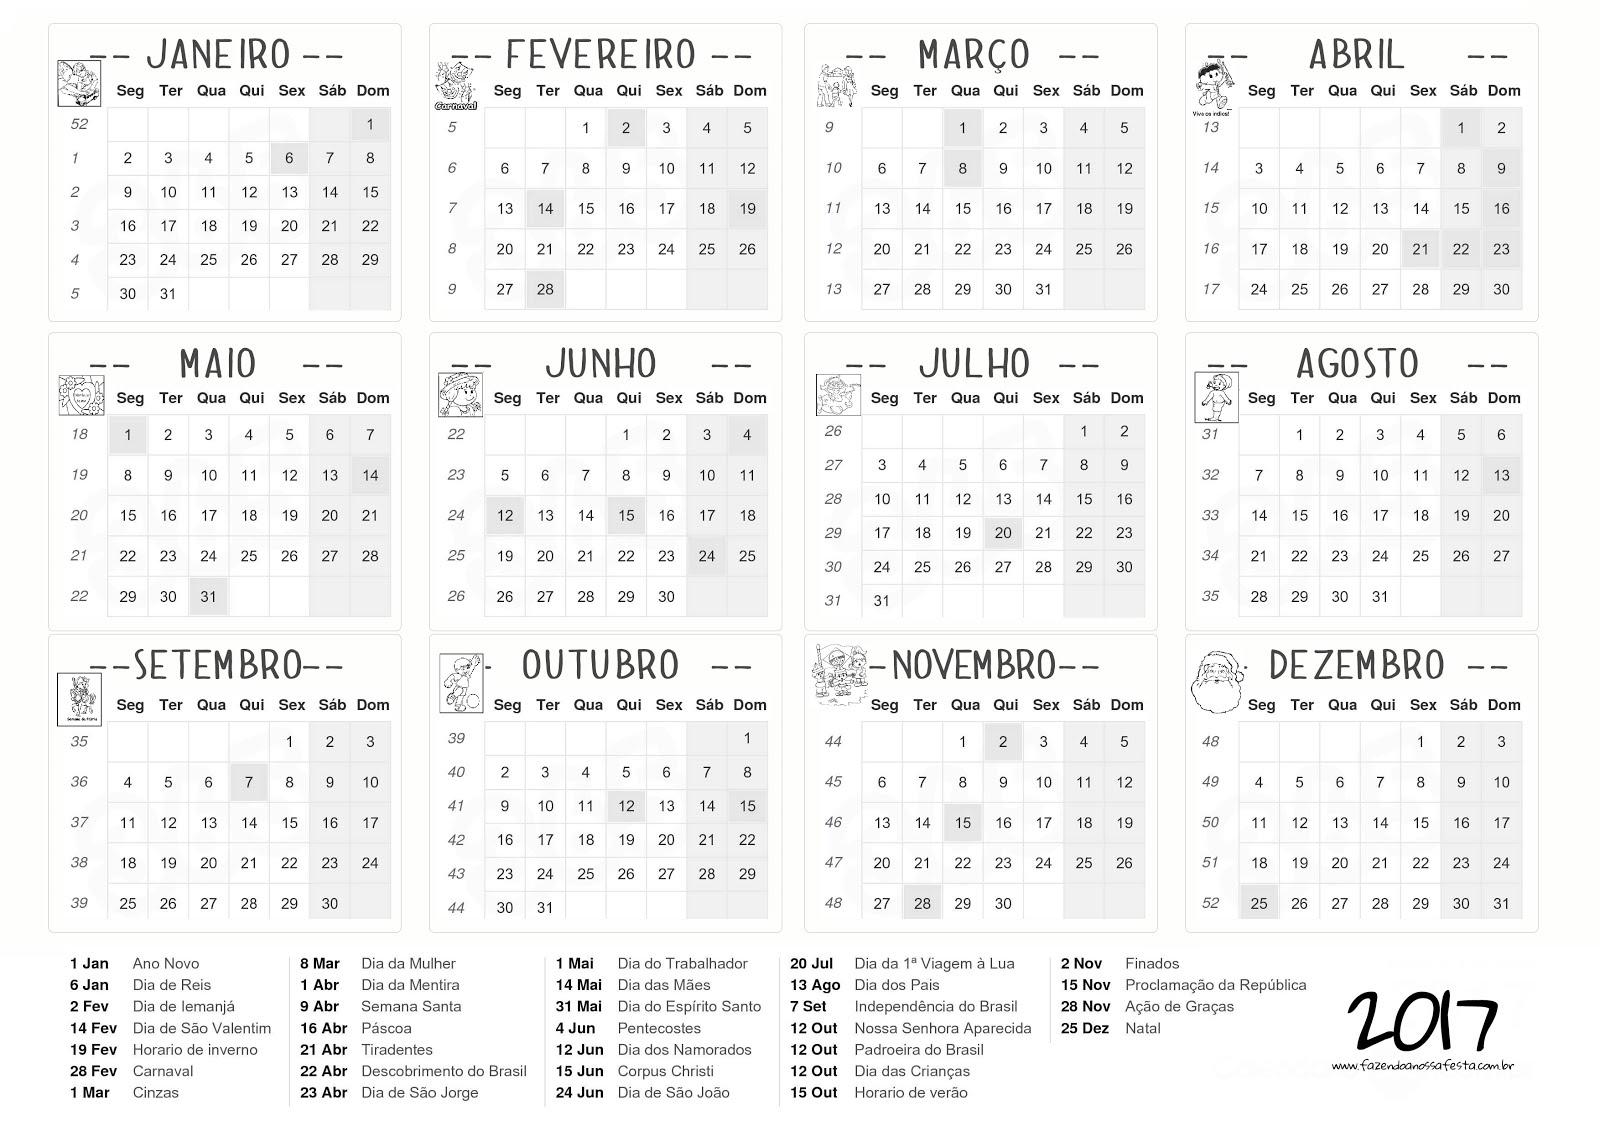 Calend rio 2017 imprimir e baixar s escola - Calendario 2017 para imprimir por meses ...